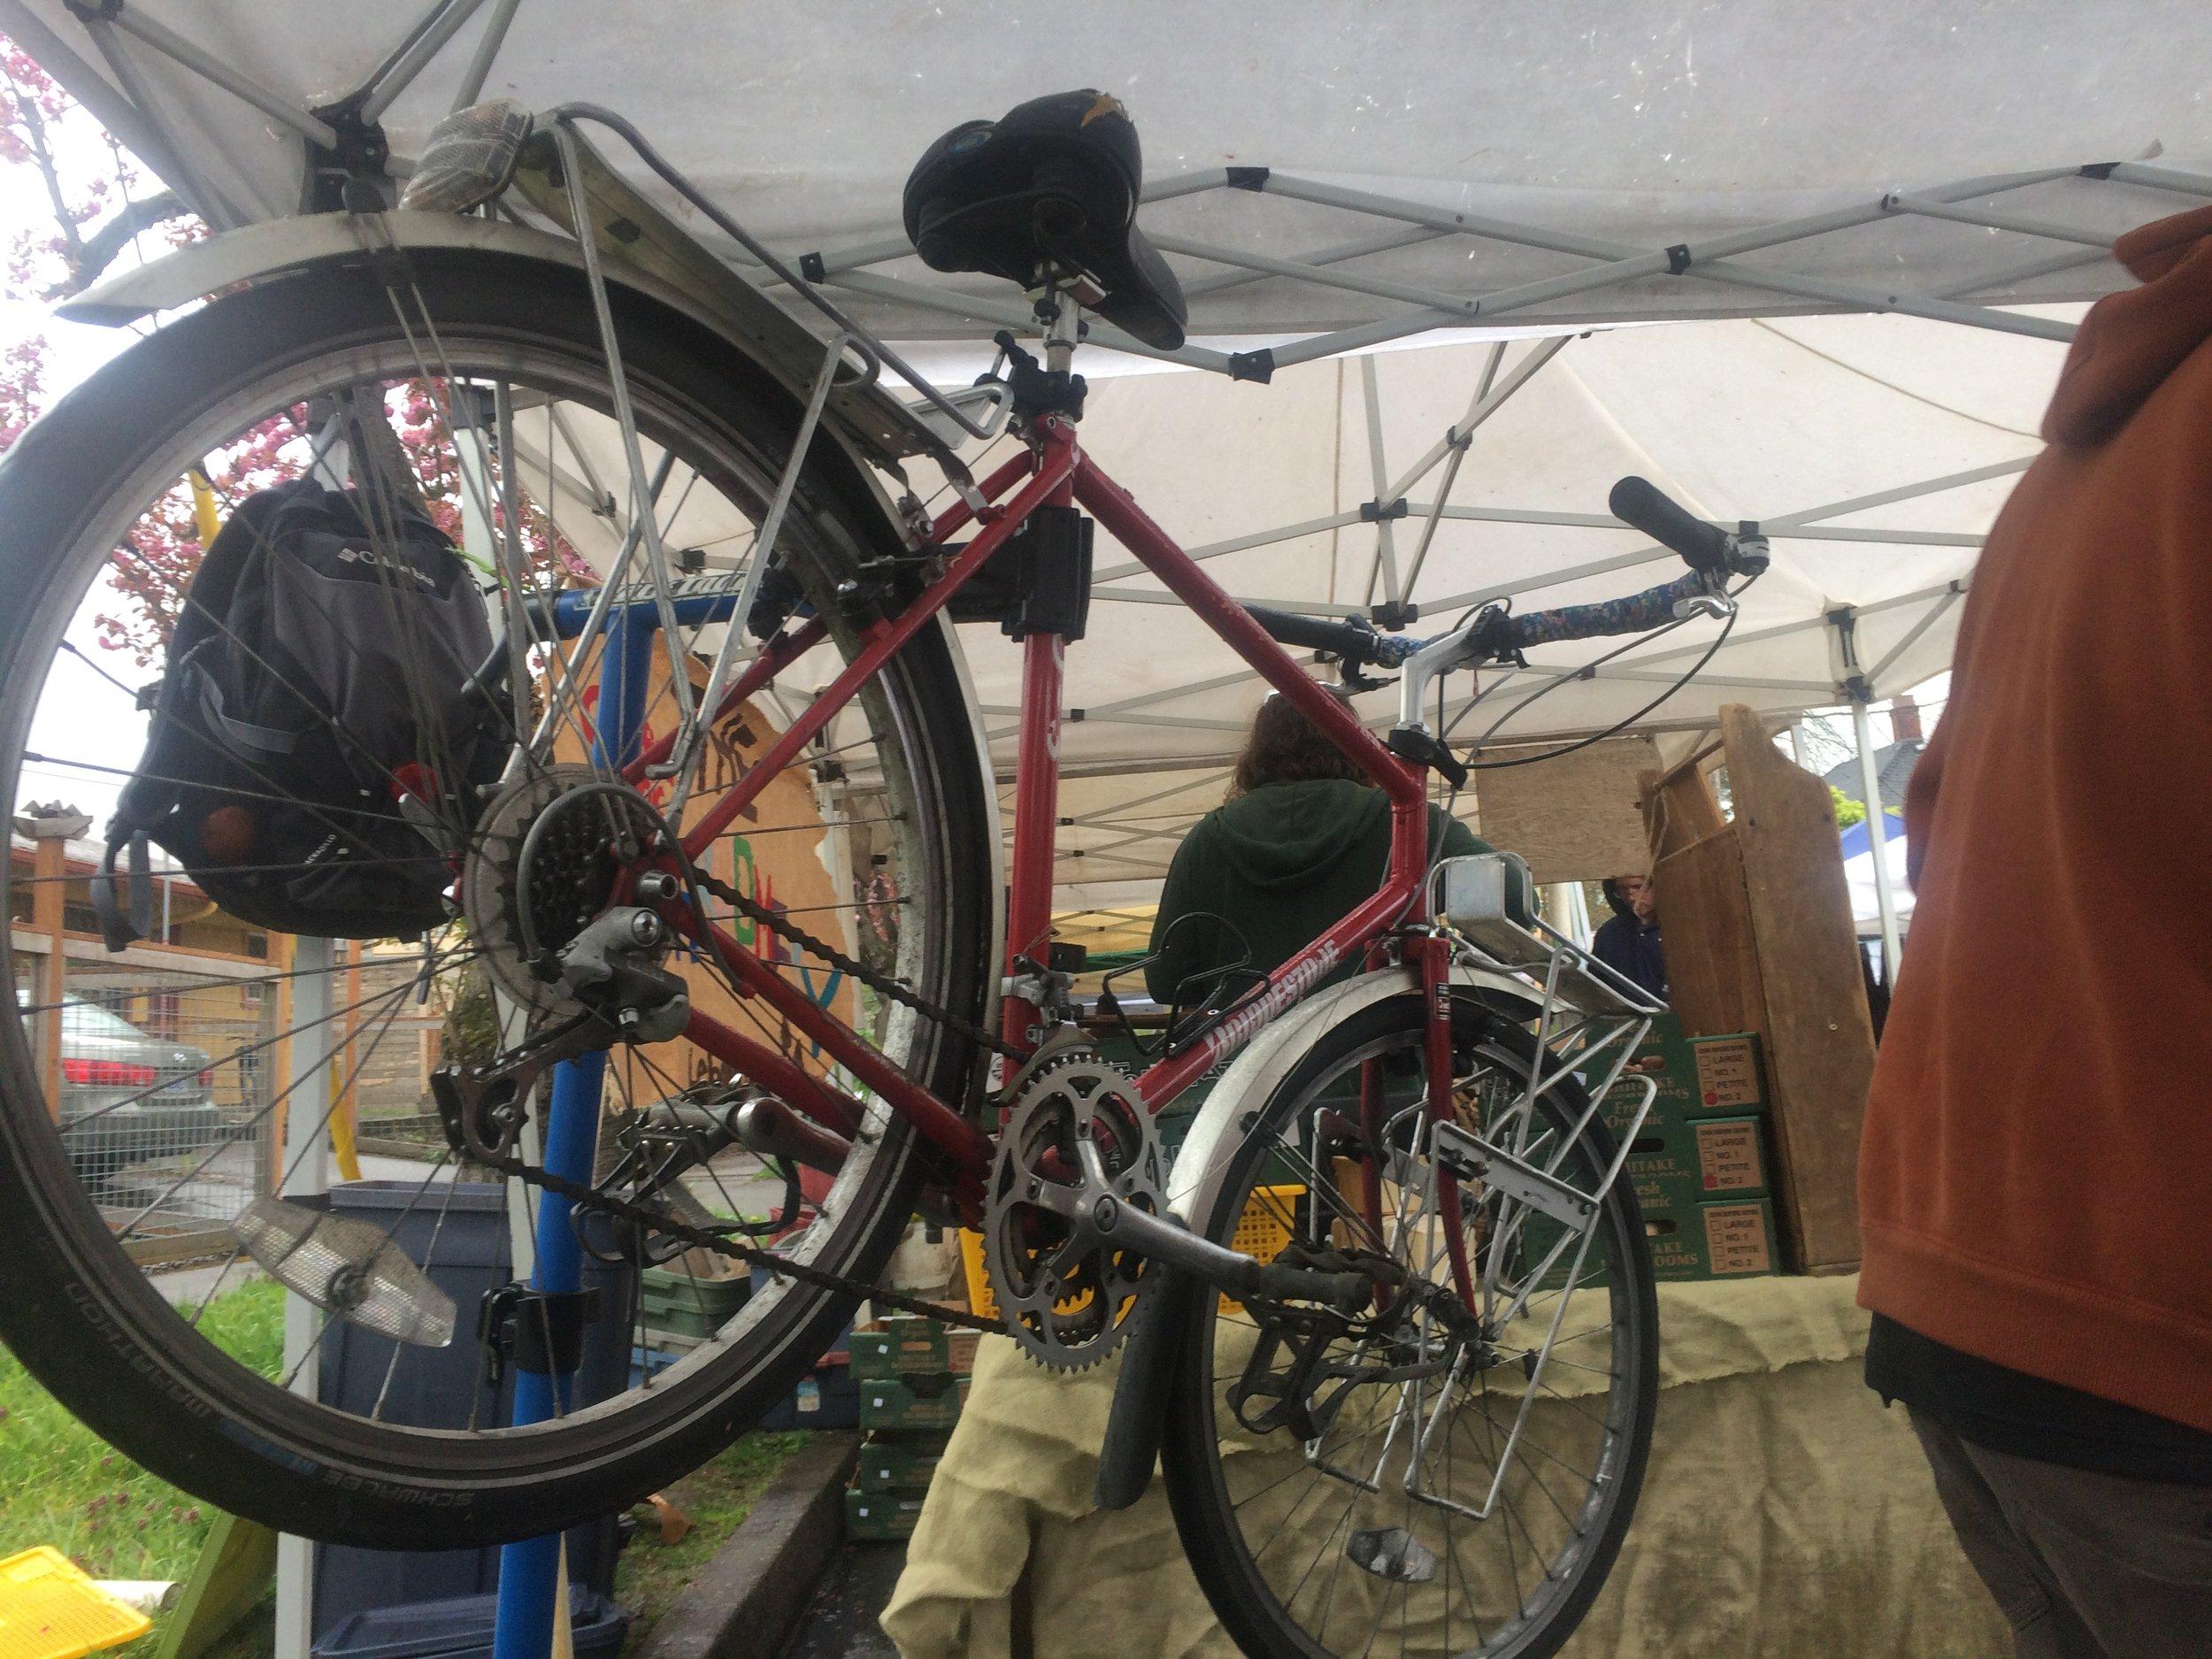 A free repair workshop at People's Co-op's farmer's market